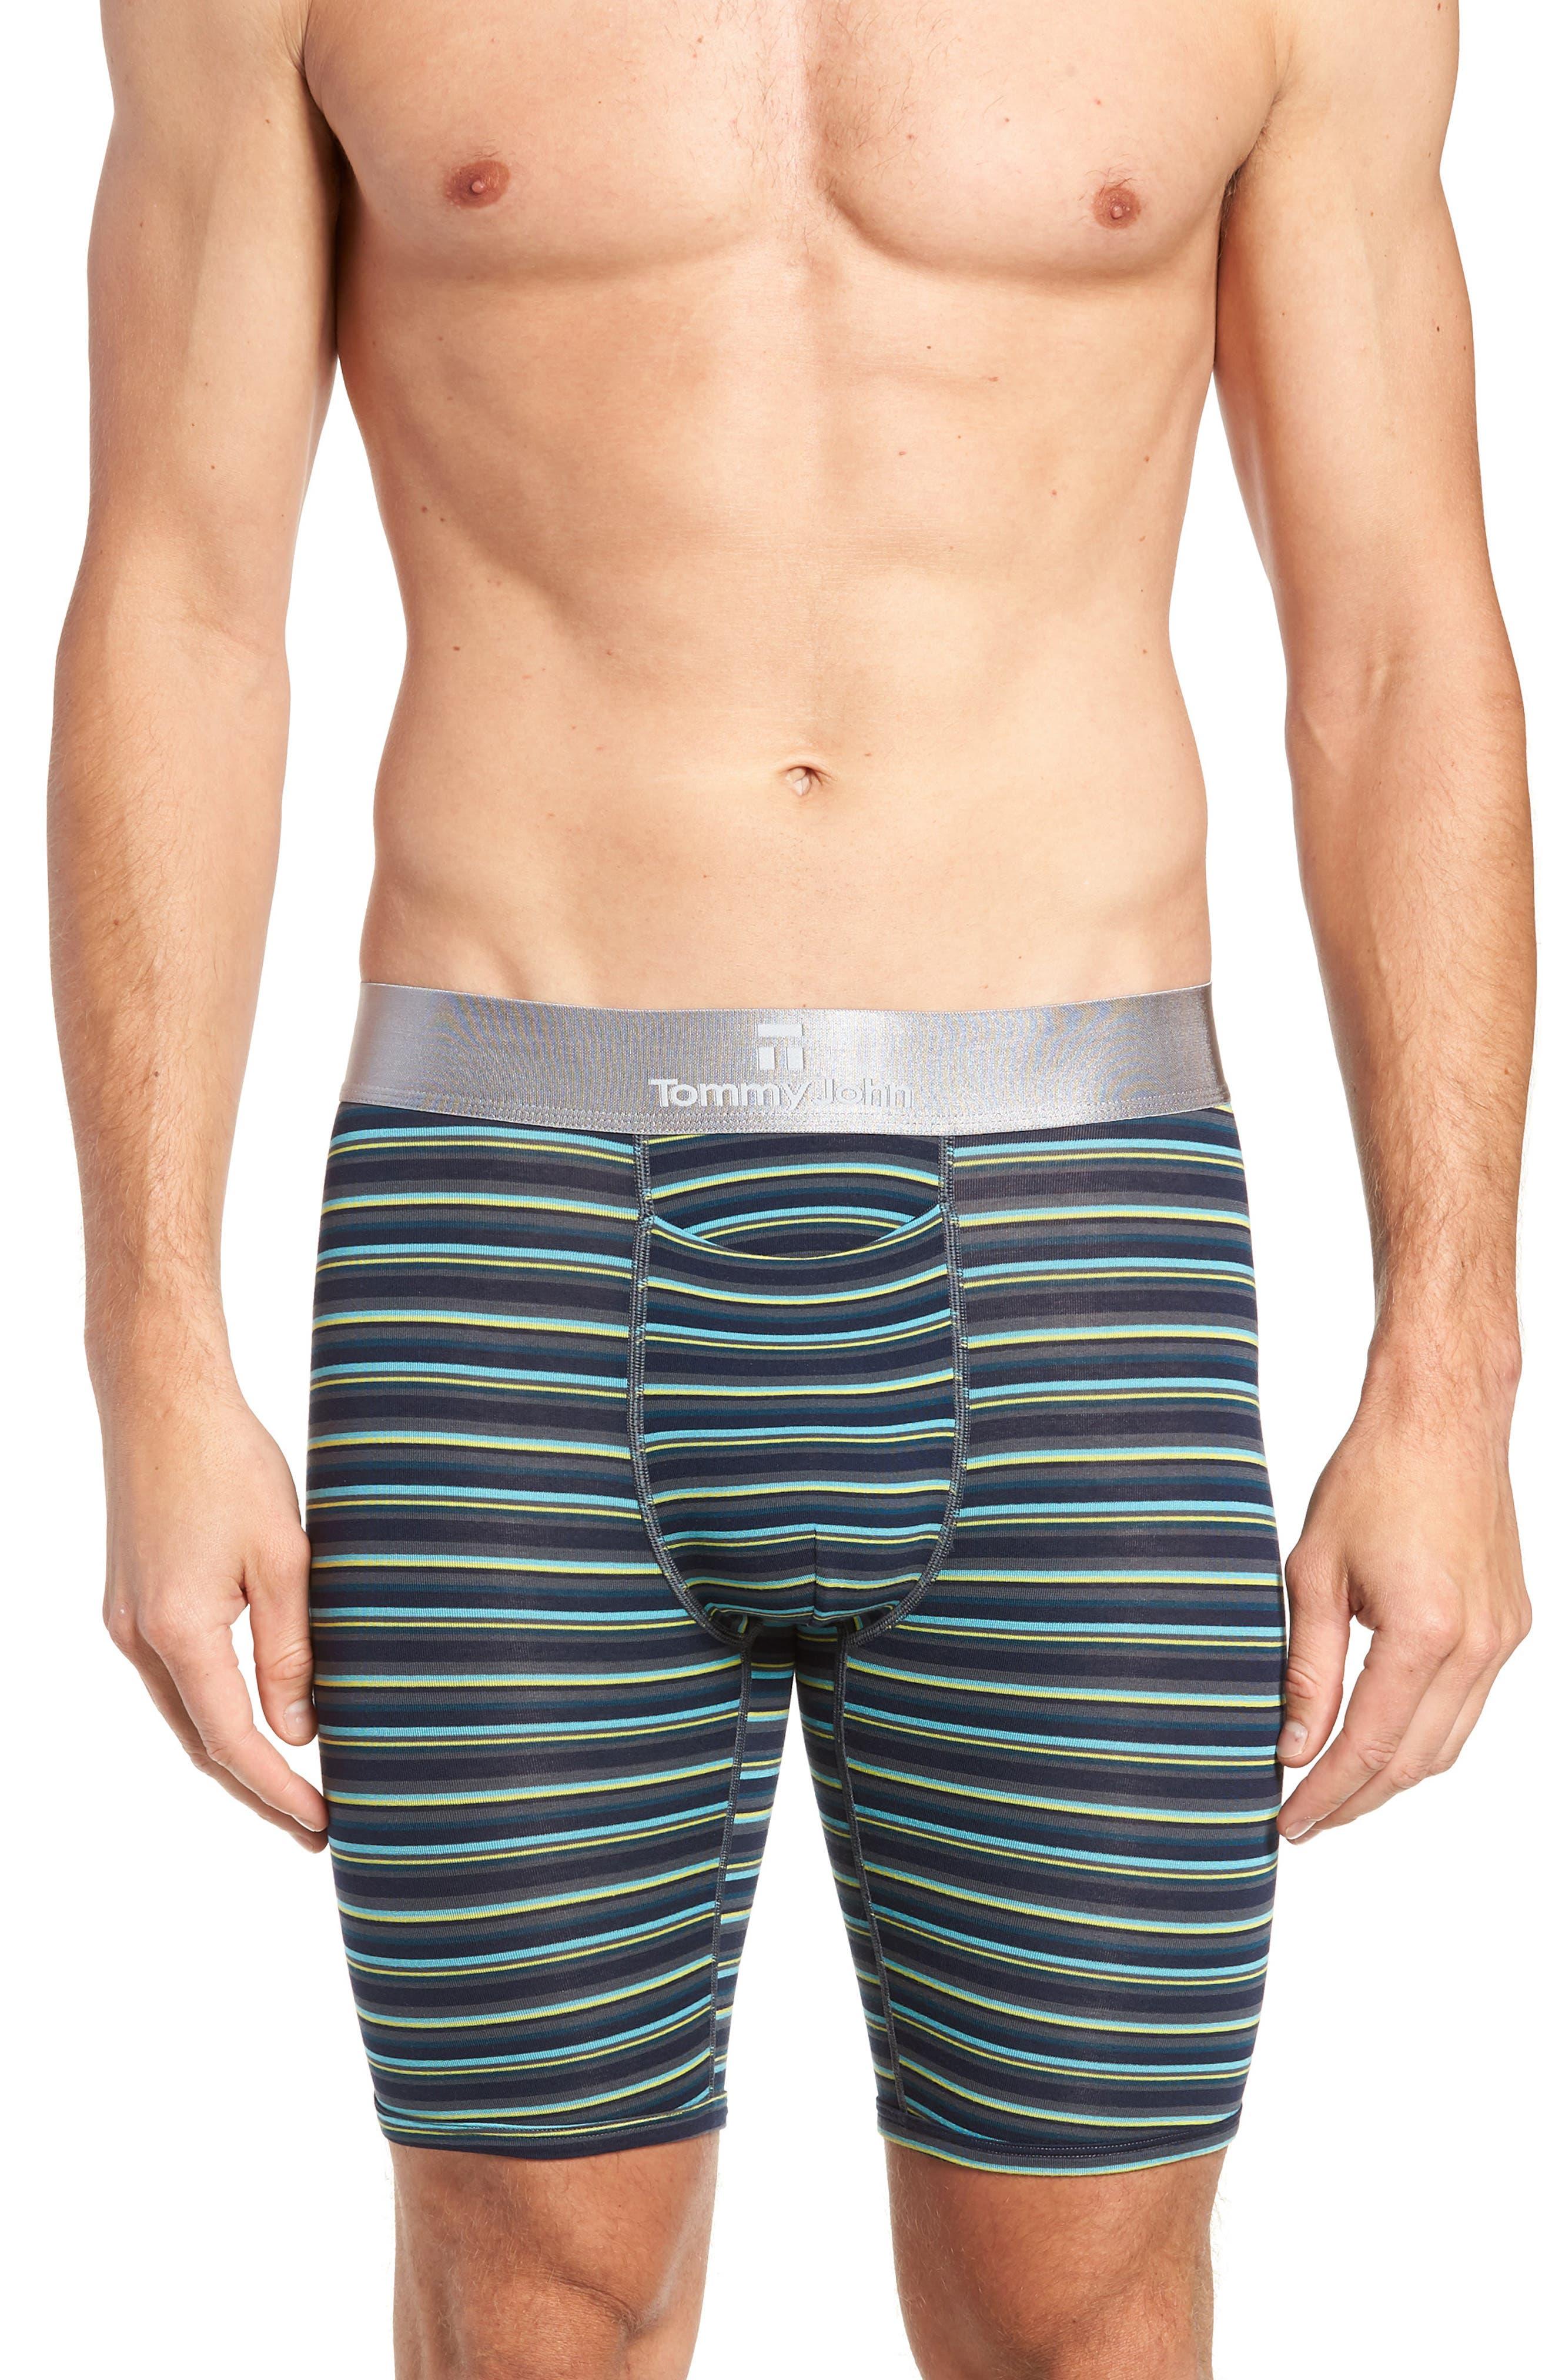 Second Skin Boxer Briefs,                         Main,                         color, DRESS BLUES/ TURBULENCE